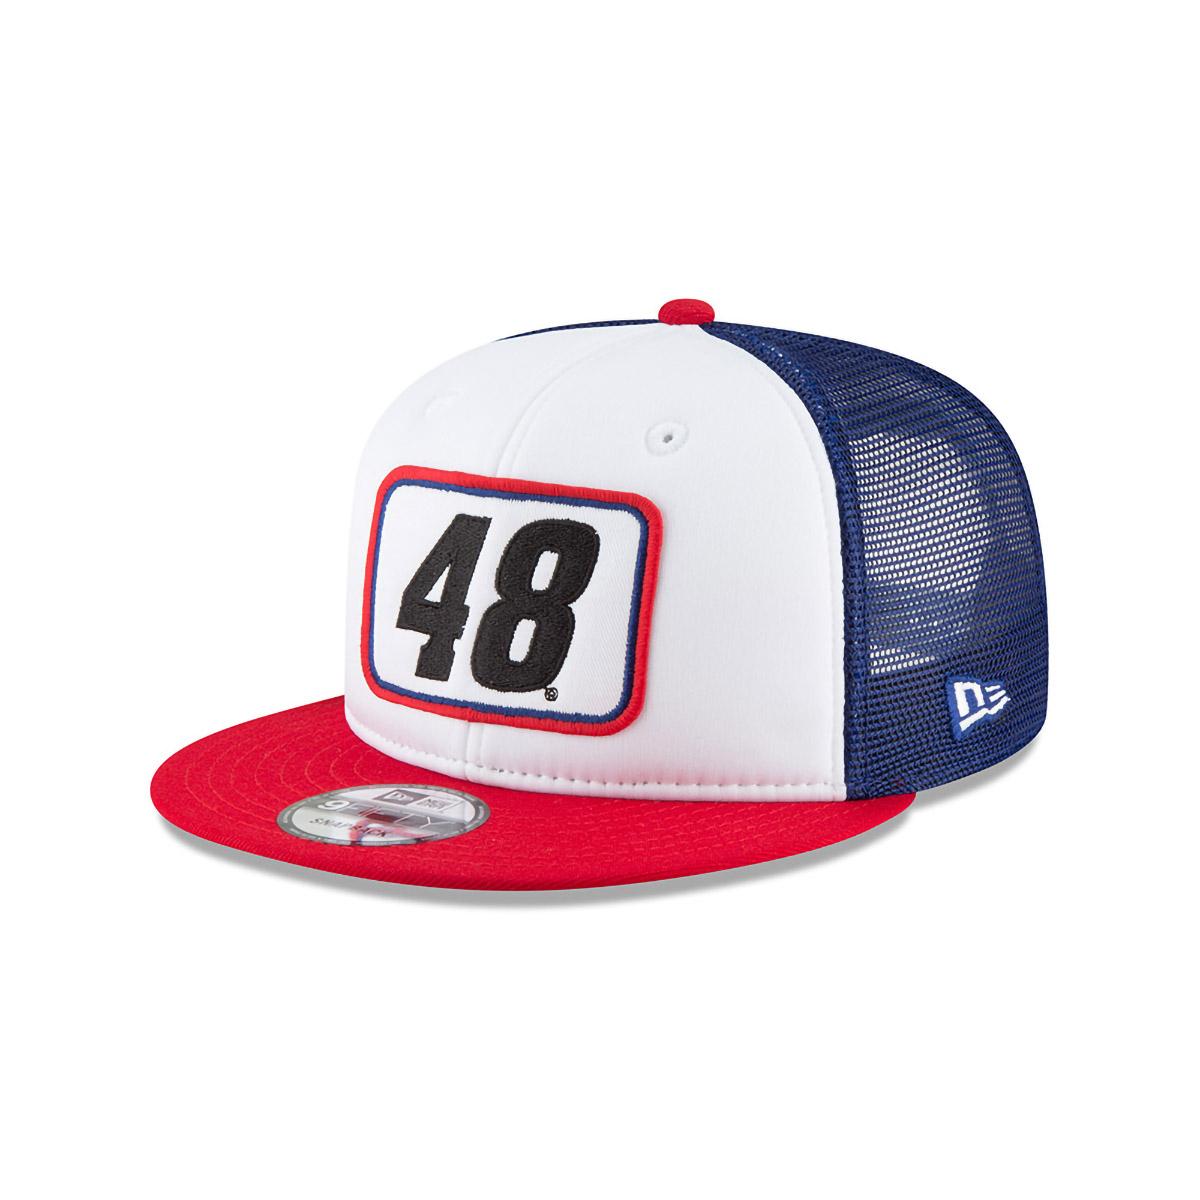 Jimmie Johnson 2018 #48 Team Pride Trucker NEW ERA 9FIFTY Cap